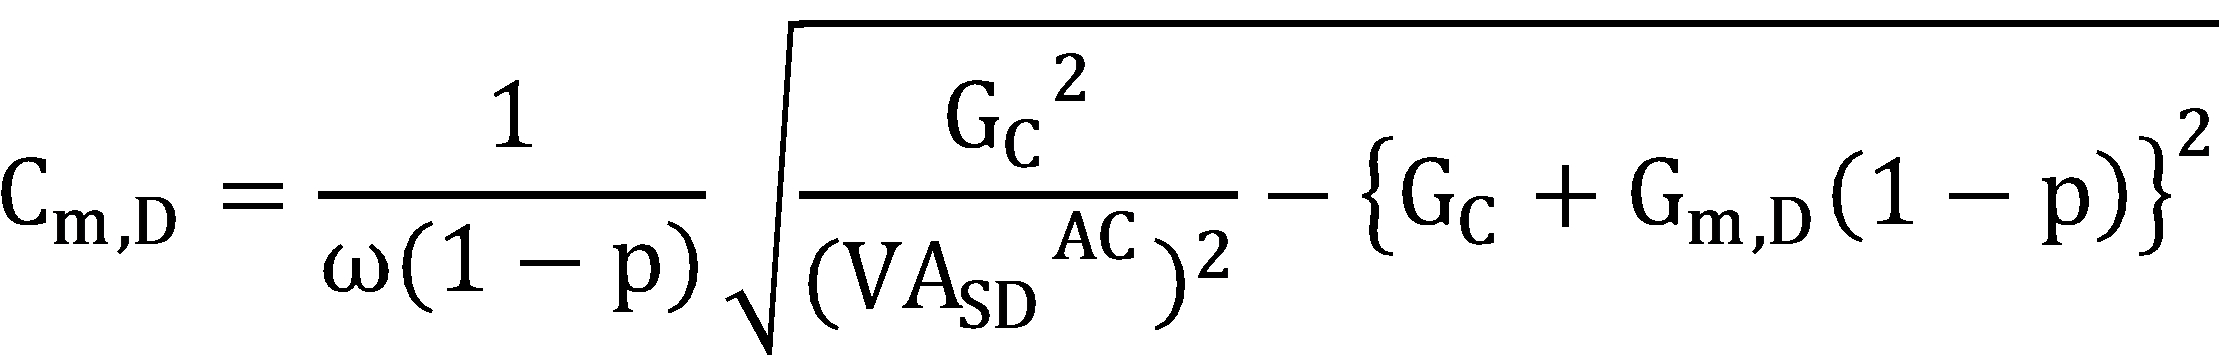 Figure 112014054251163-pat00023